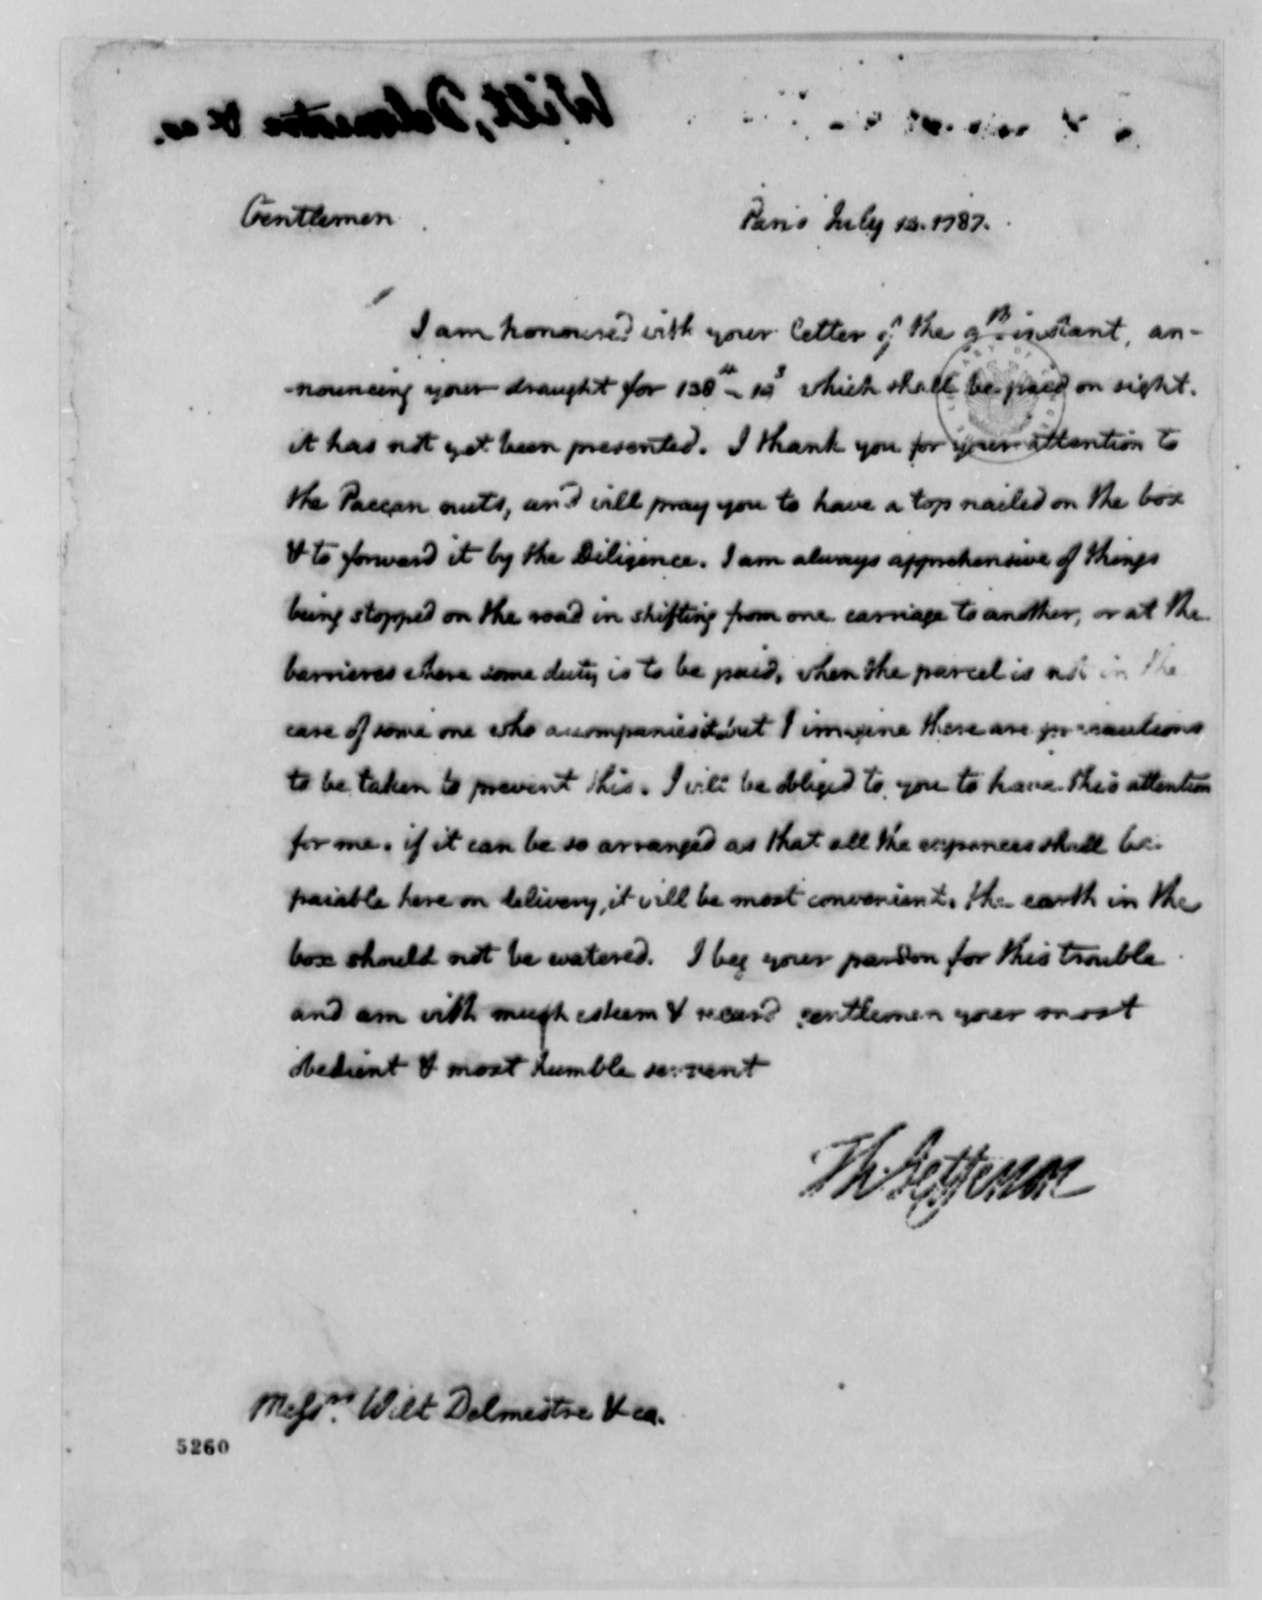 Thomas Jefferson to Wilt, Delmestre & Company, July 14, 1787